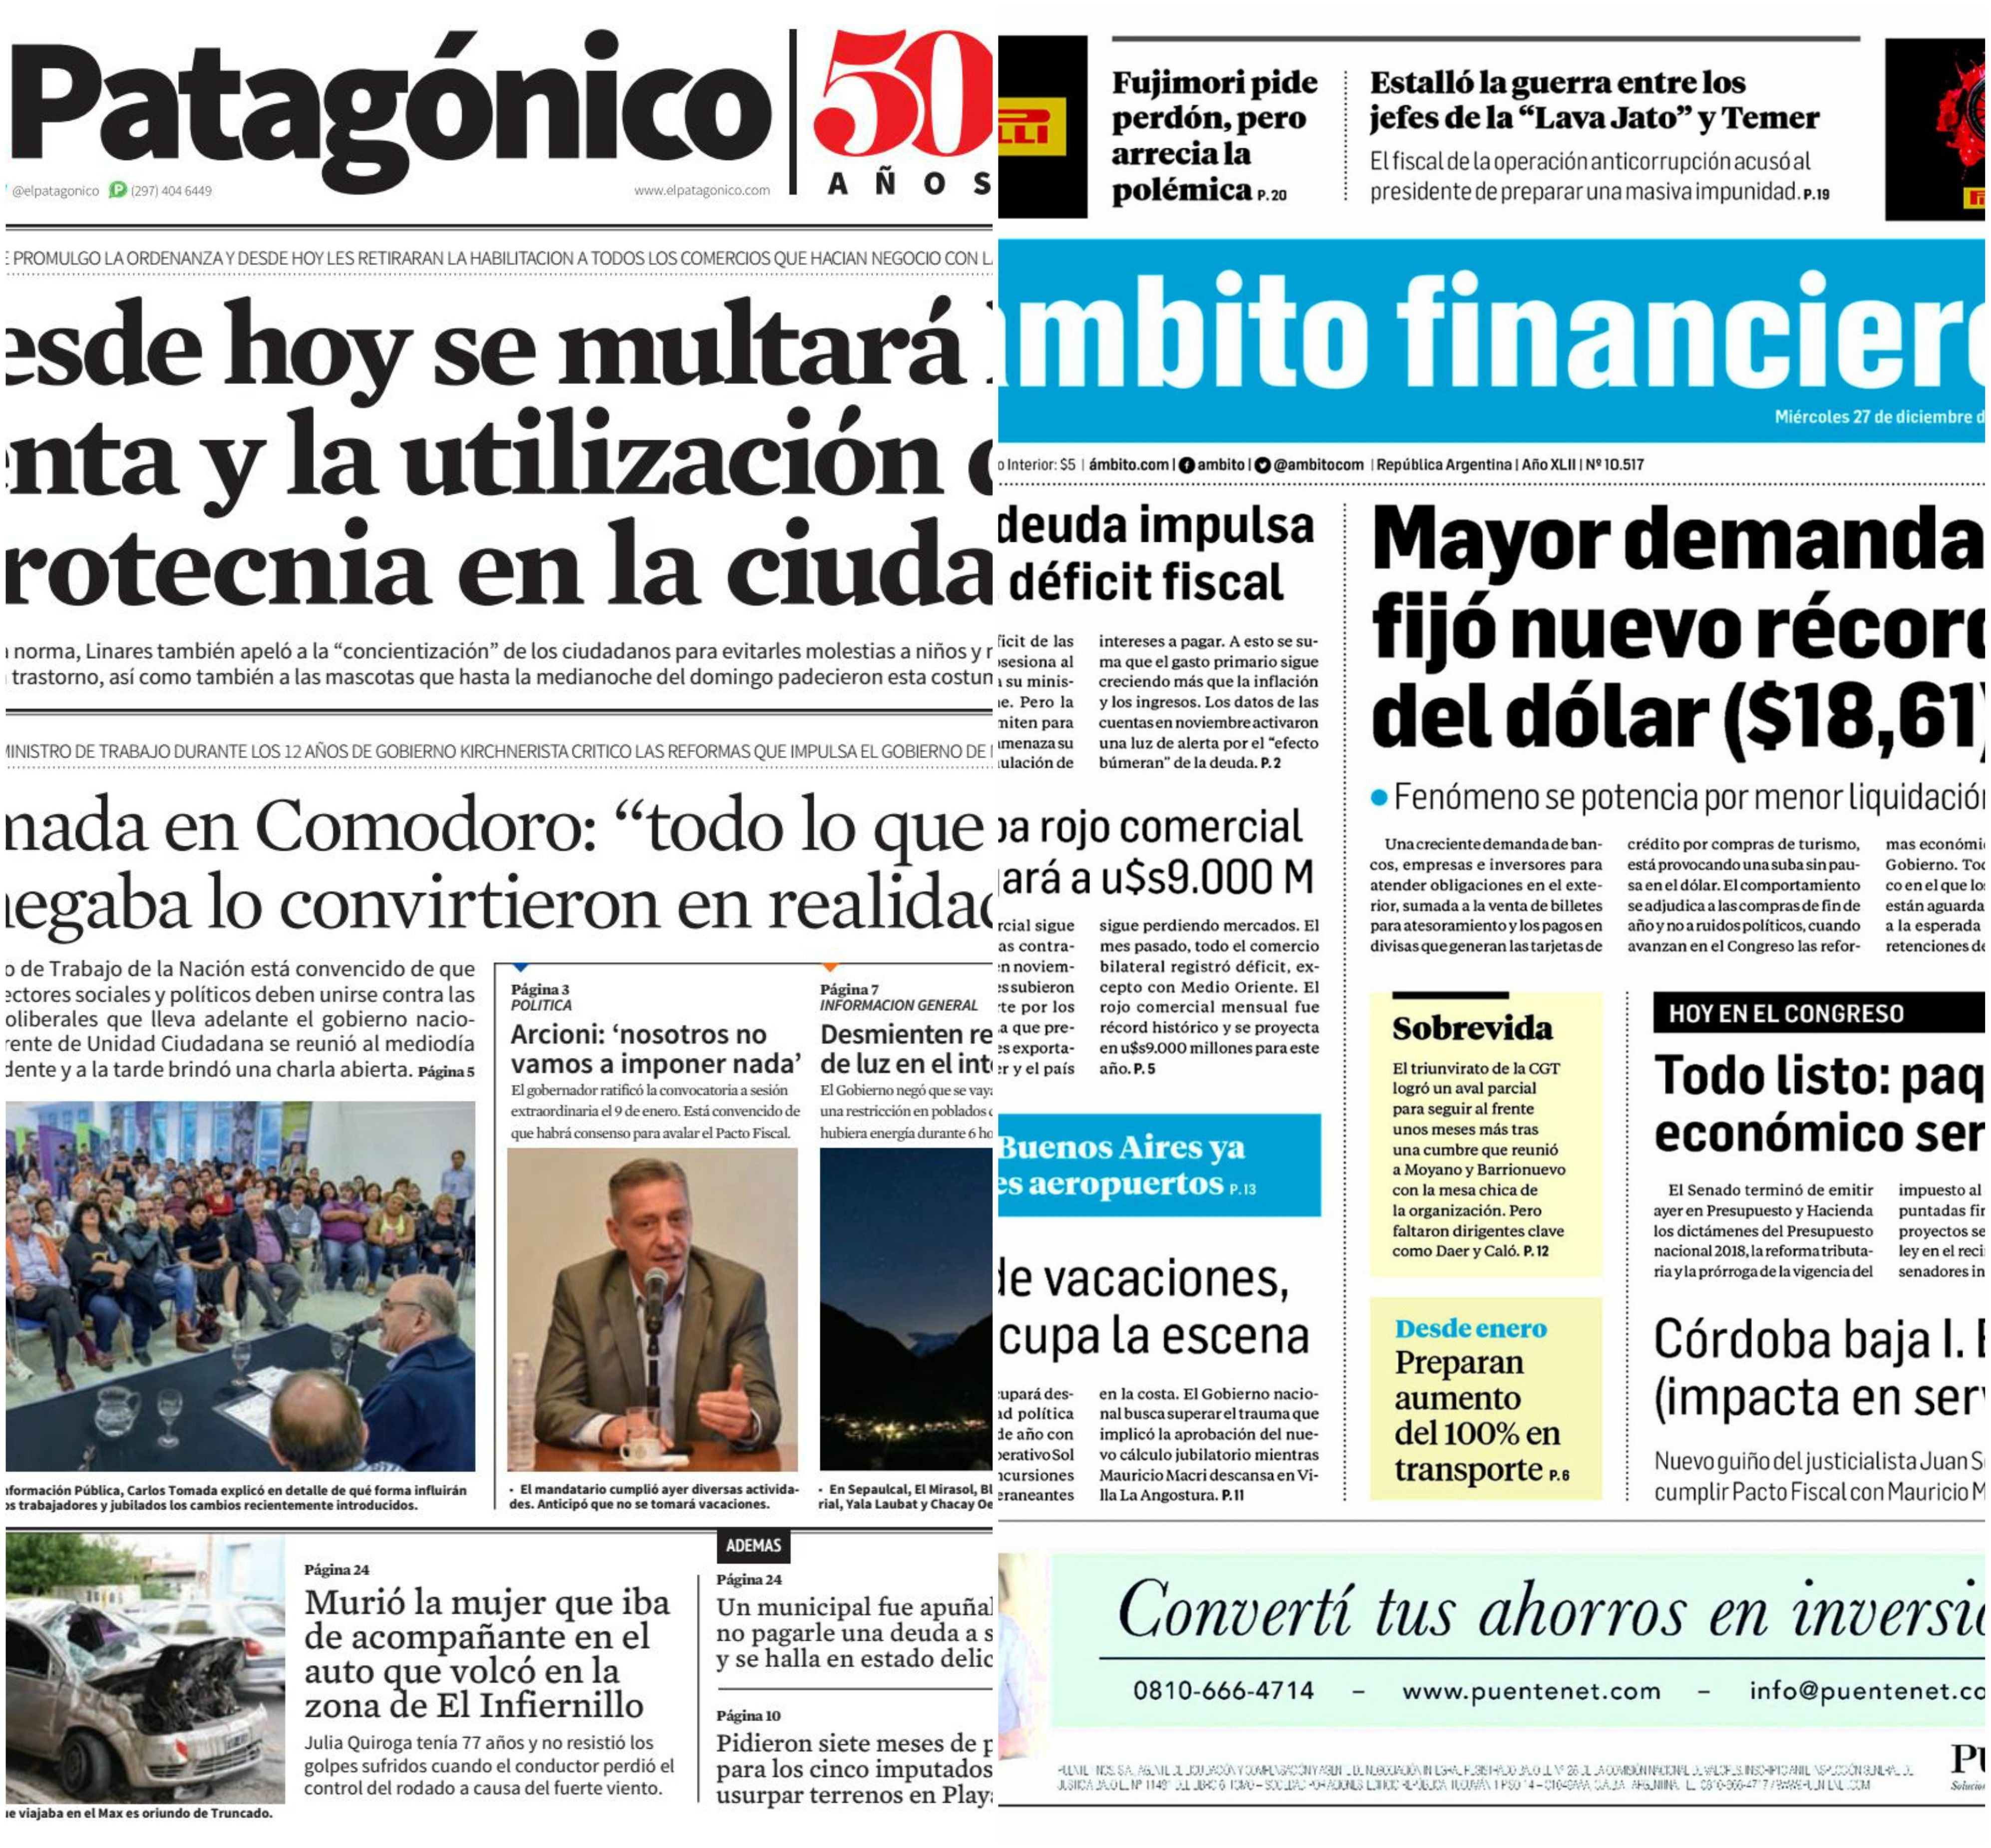 Tapas de diarios del miercoles 27 de diciembre de 2017